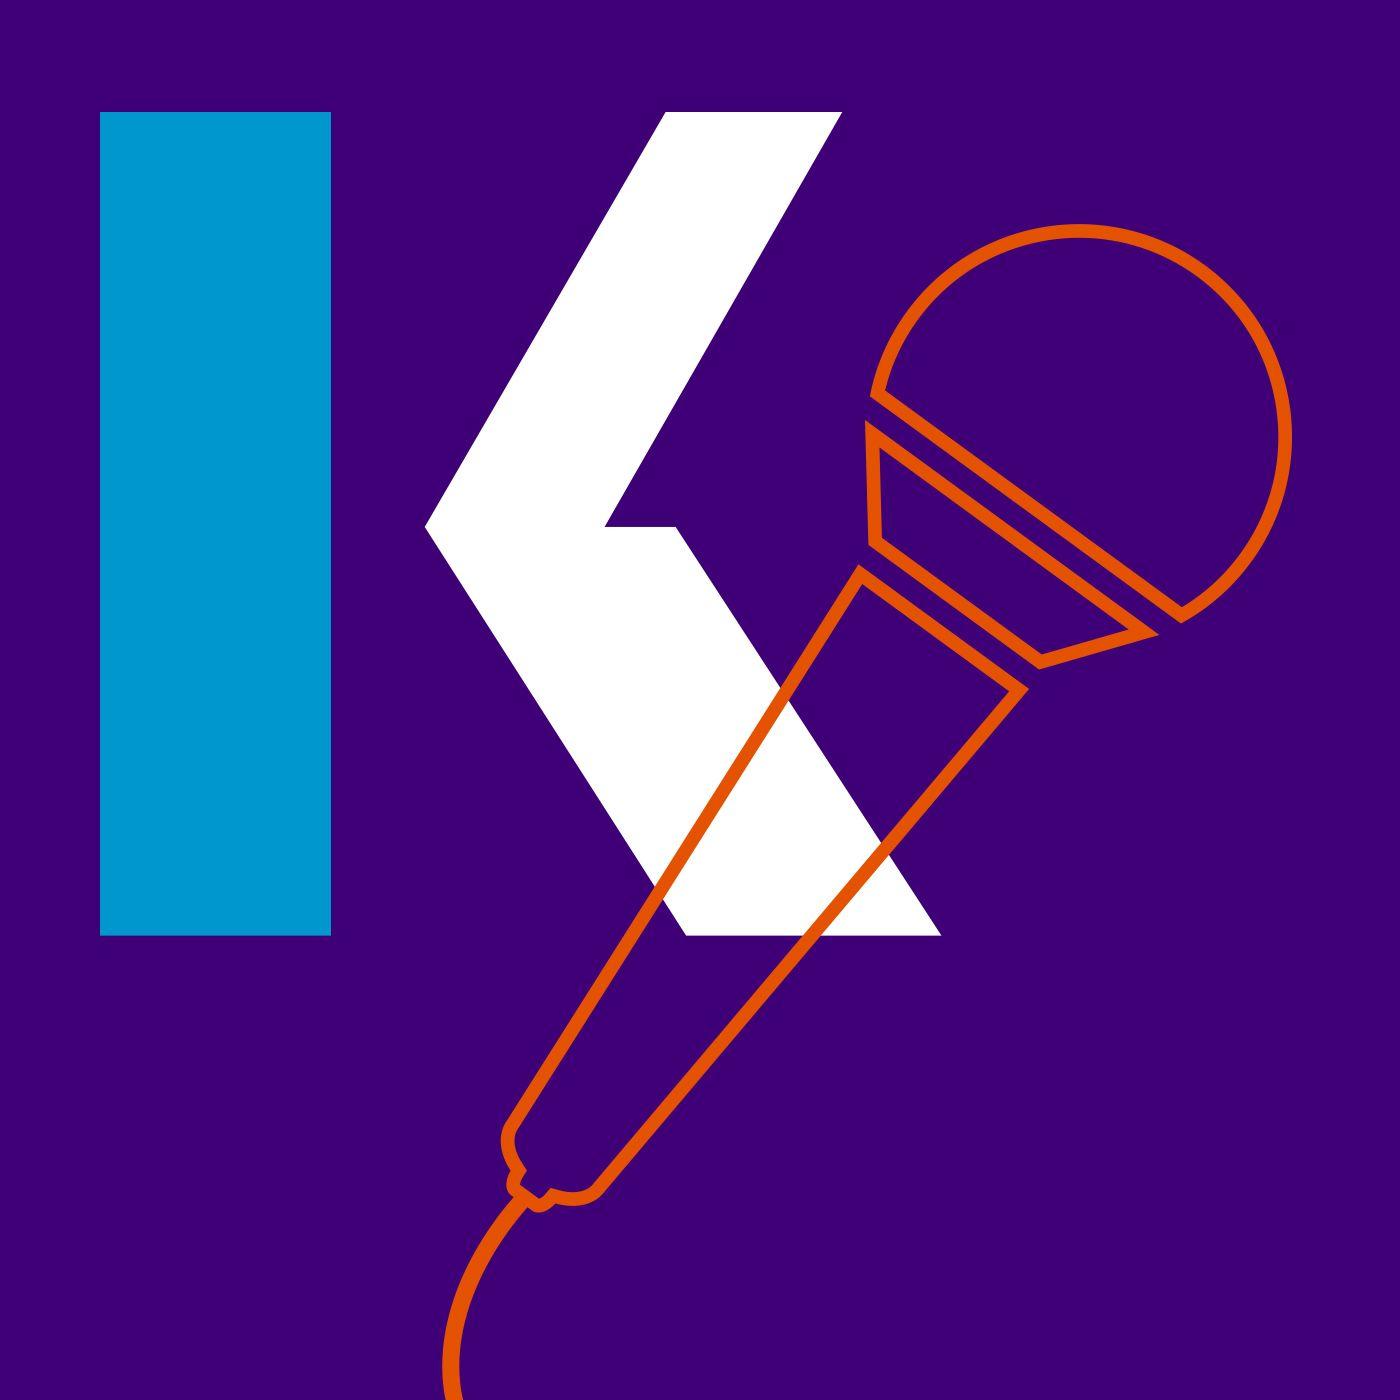 Kaplan's NCLEX Prepcast - Episode 32 - Managing ethical dilemmas in nursing